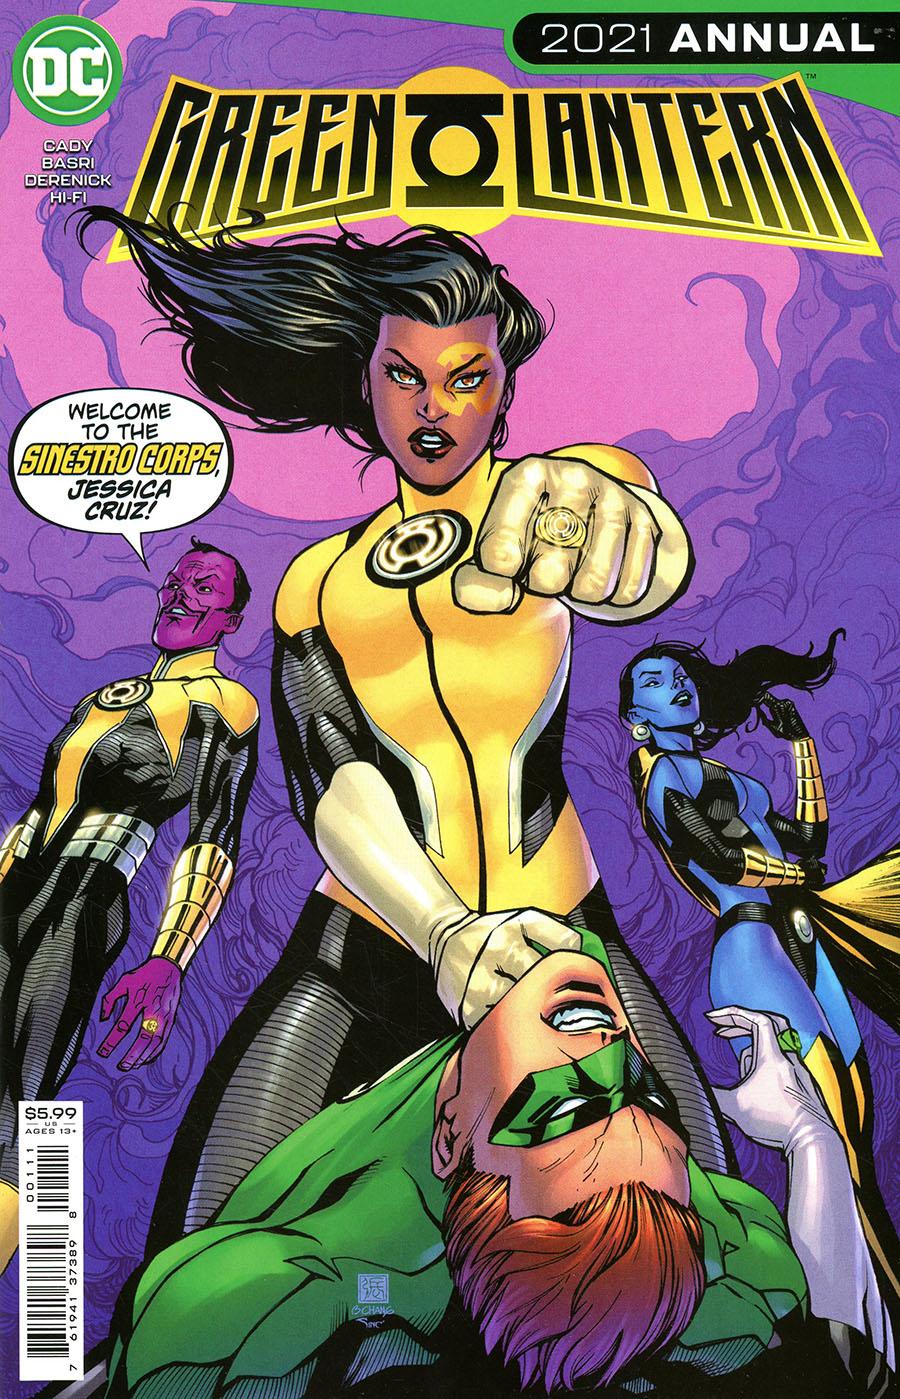 Green Lantern Vol 7 2021 Annual #1 Cover A Regular Bernard Chang Cover